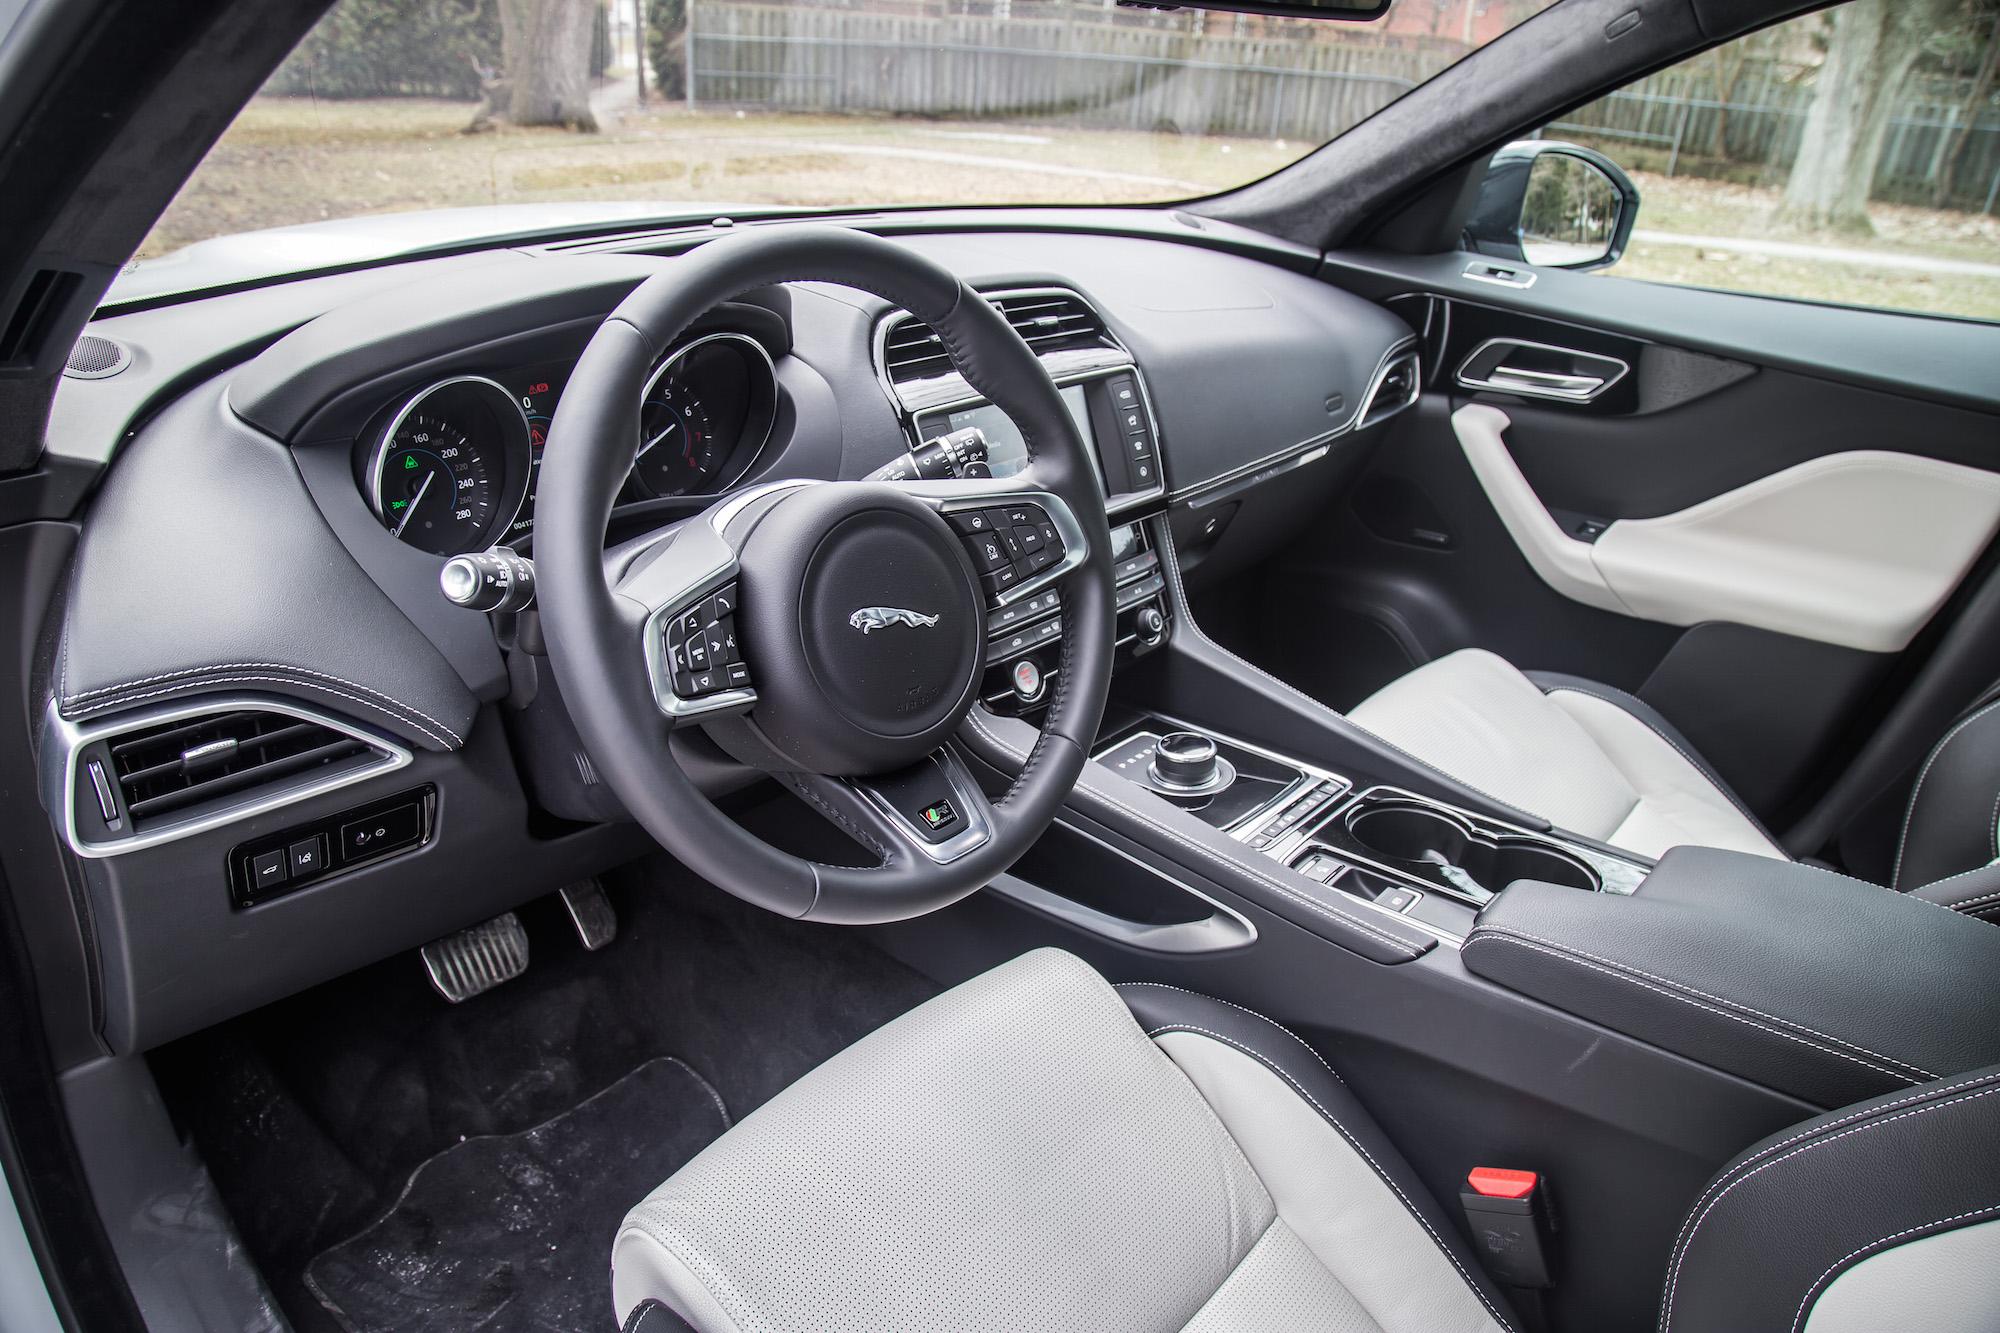 2017 Jaguar F Pace S Vs 2017 Mercedes Amg Glc43 Vs 2017